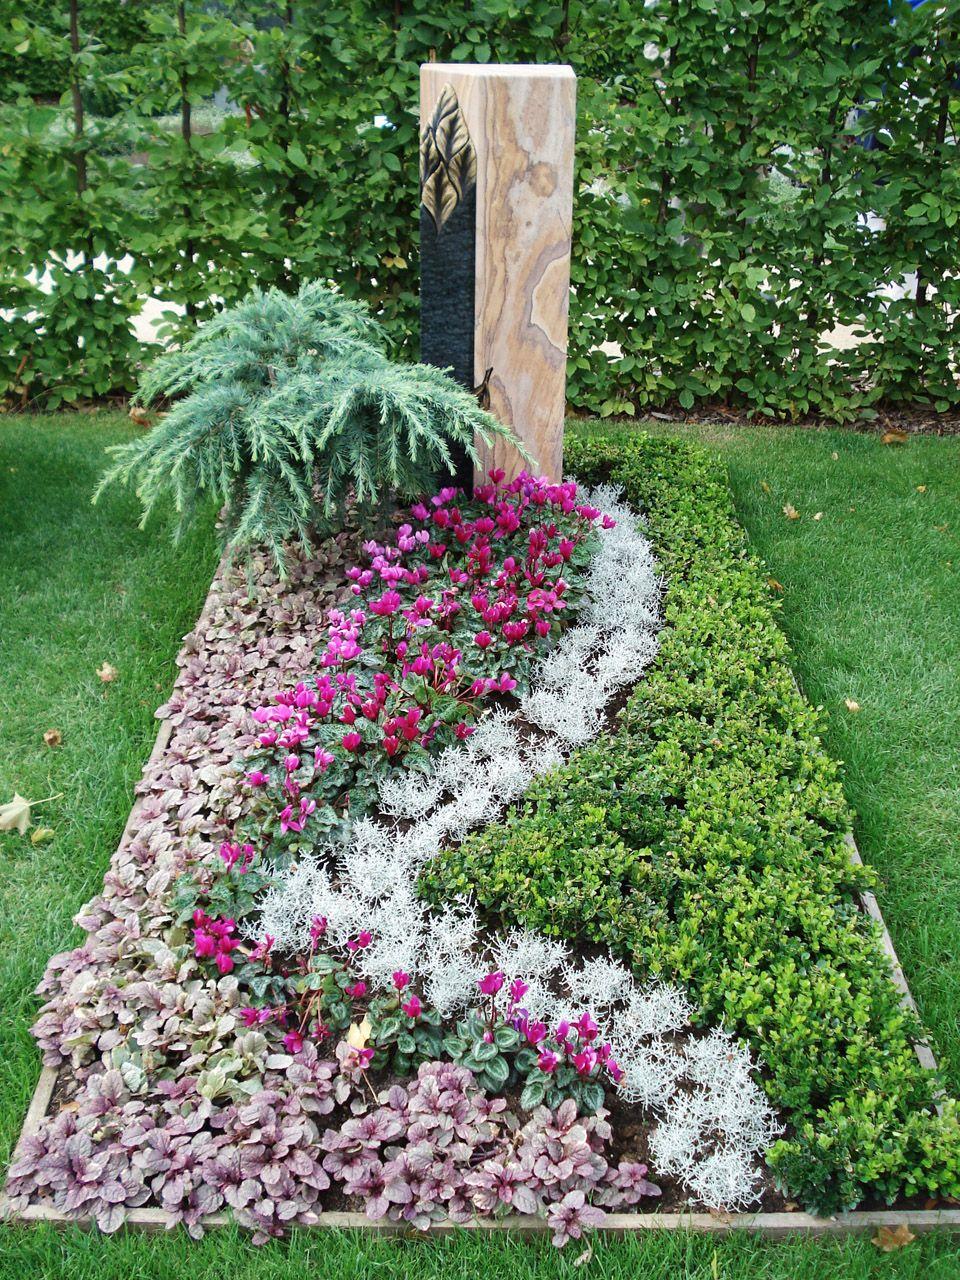 Bildergebnis fr floristik grabgestaltung  Grabgestaltung